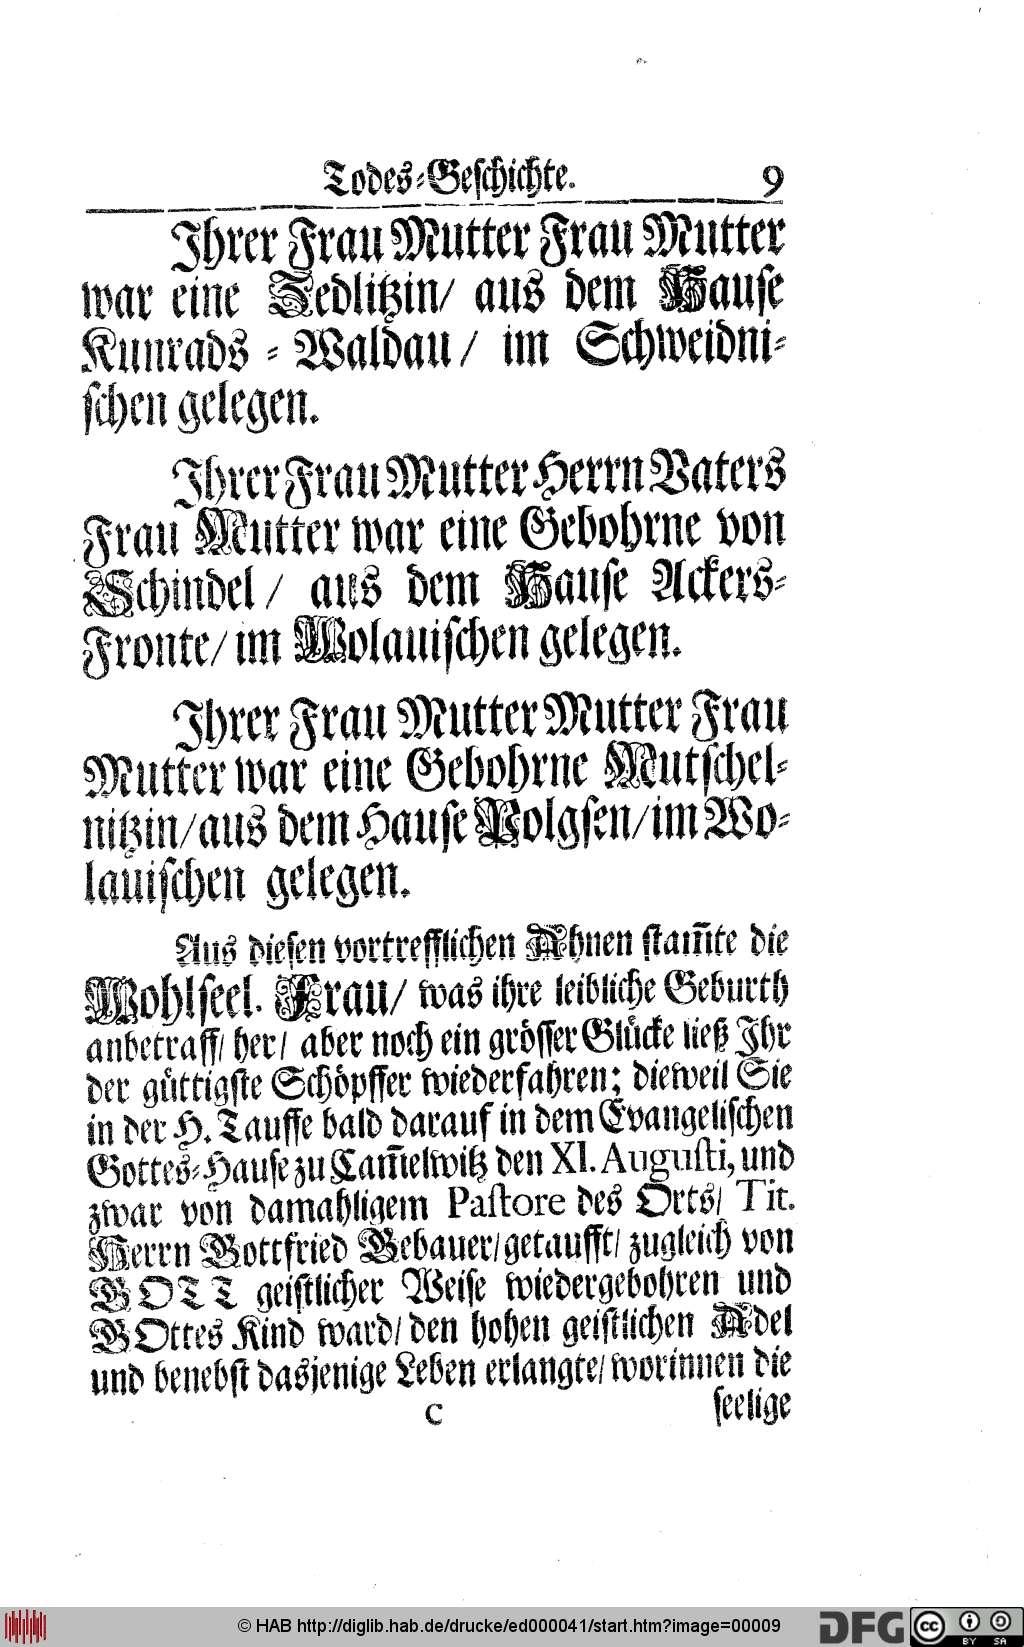 http://diglib.hab.de/drucke/ed000041/00009.jpg